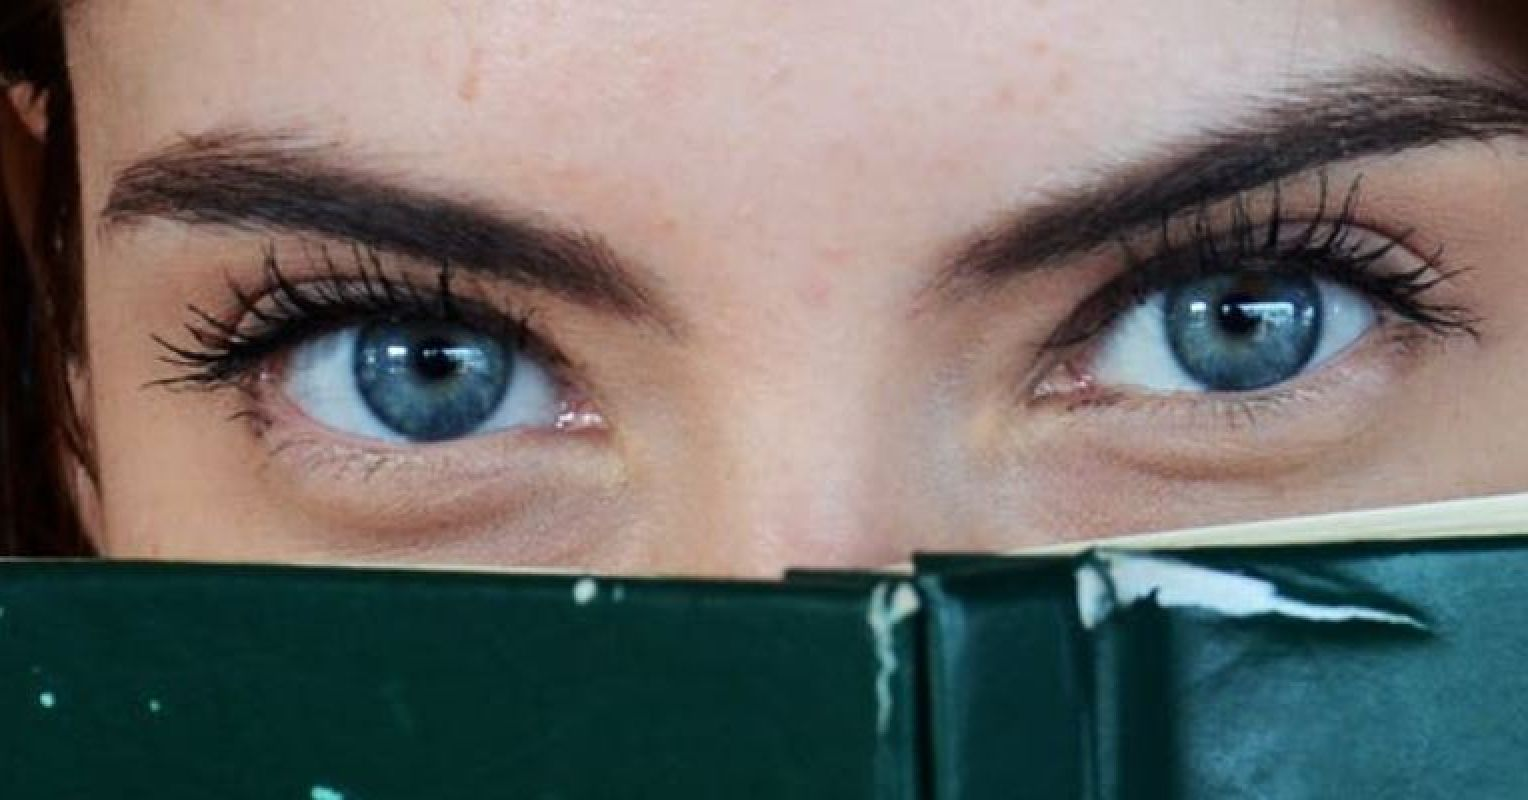 Eyebrow the why do guys flash do Crazy Subconscious